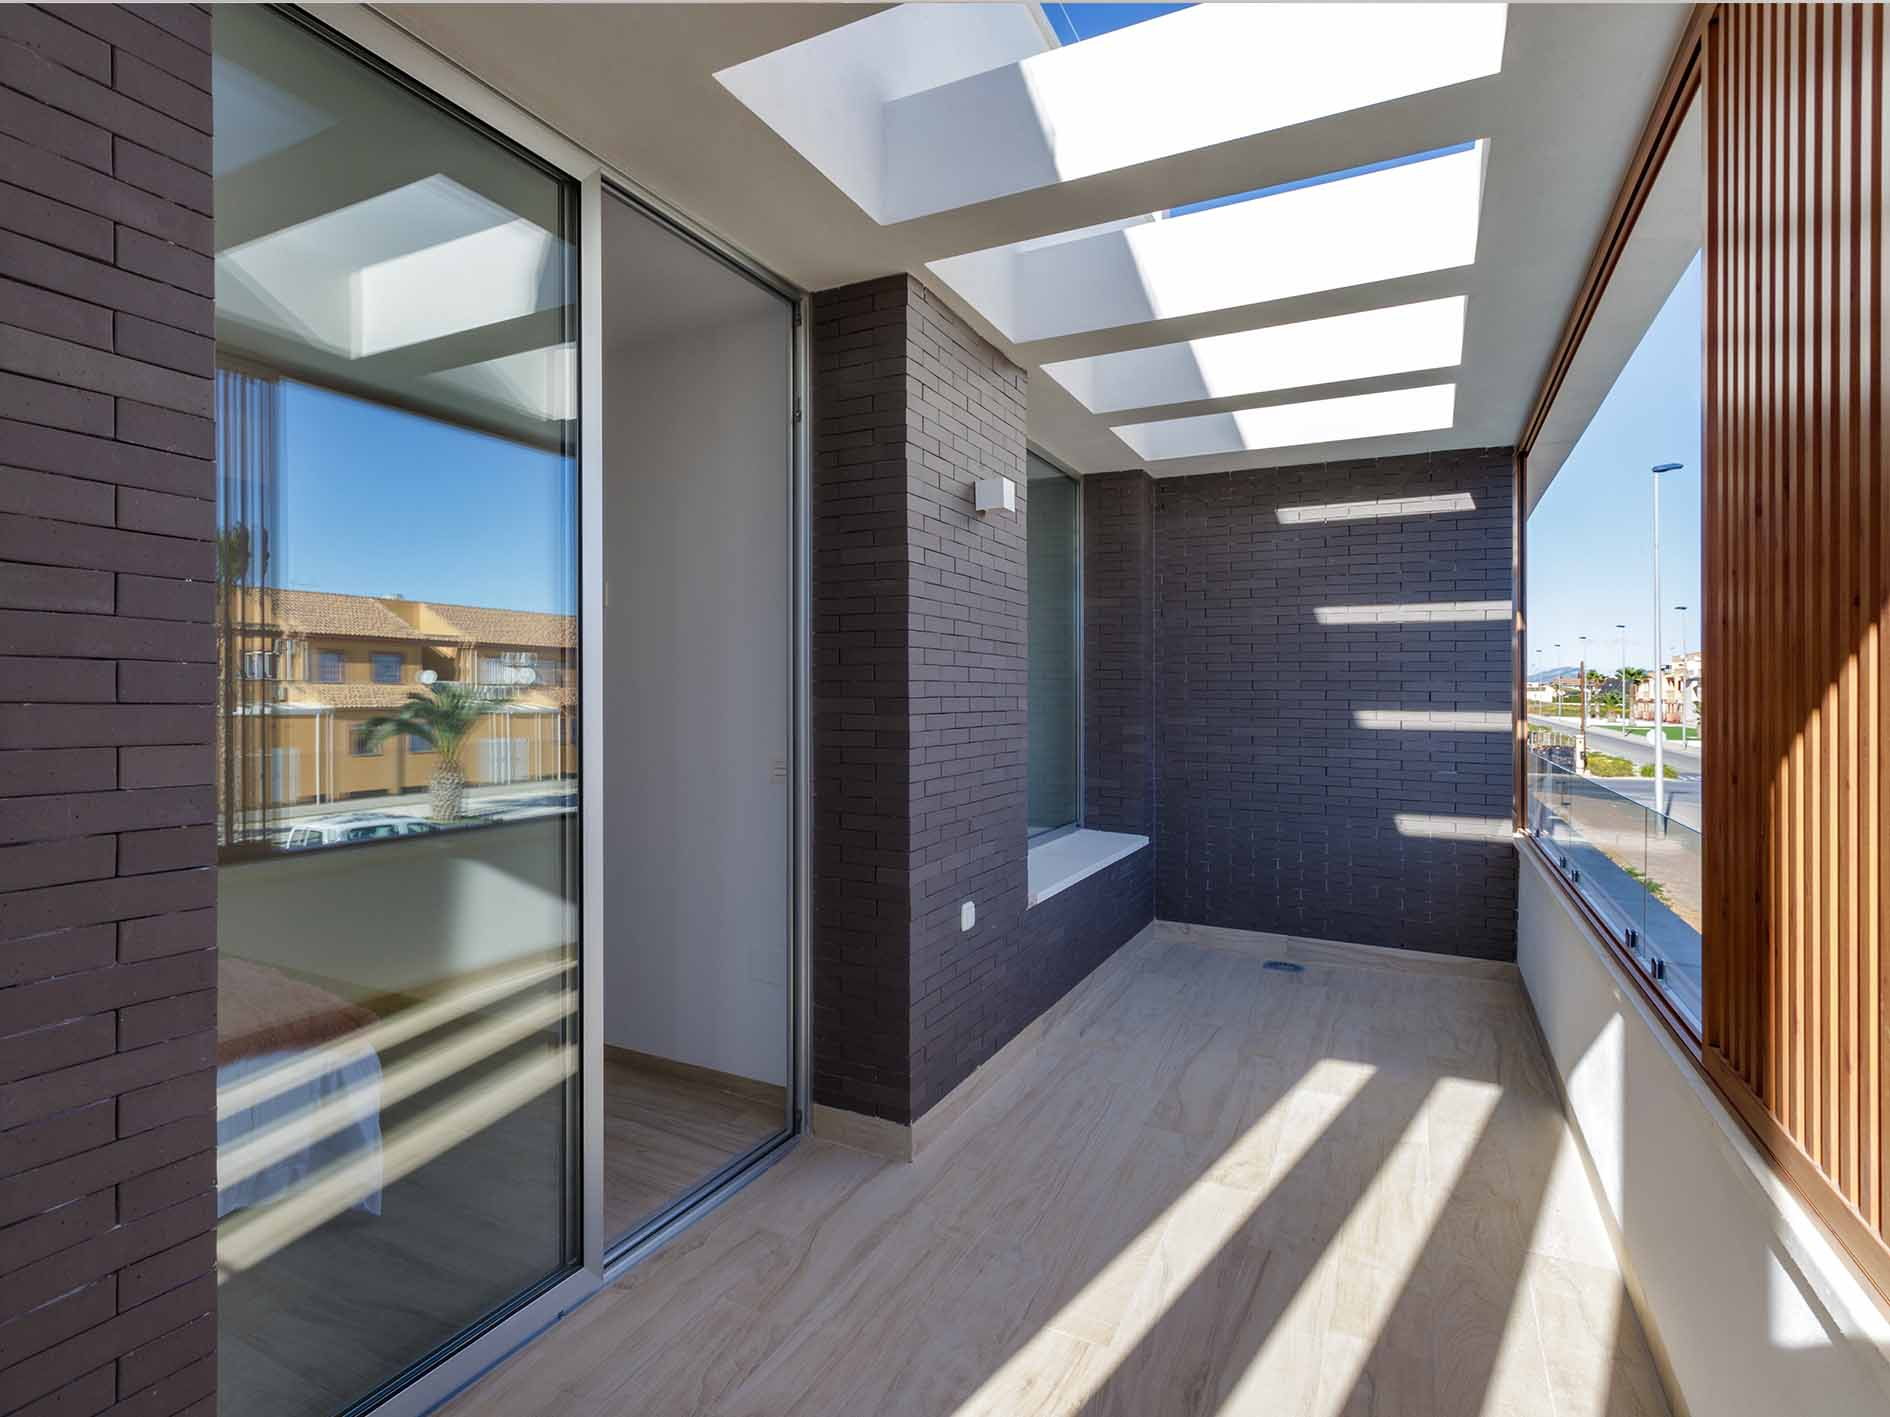 immobilier neuf espagne costa blanca on-d9 el farallon terrasse